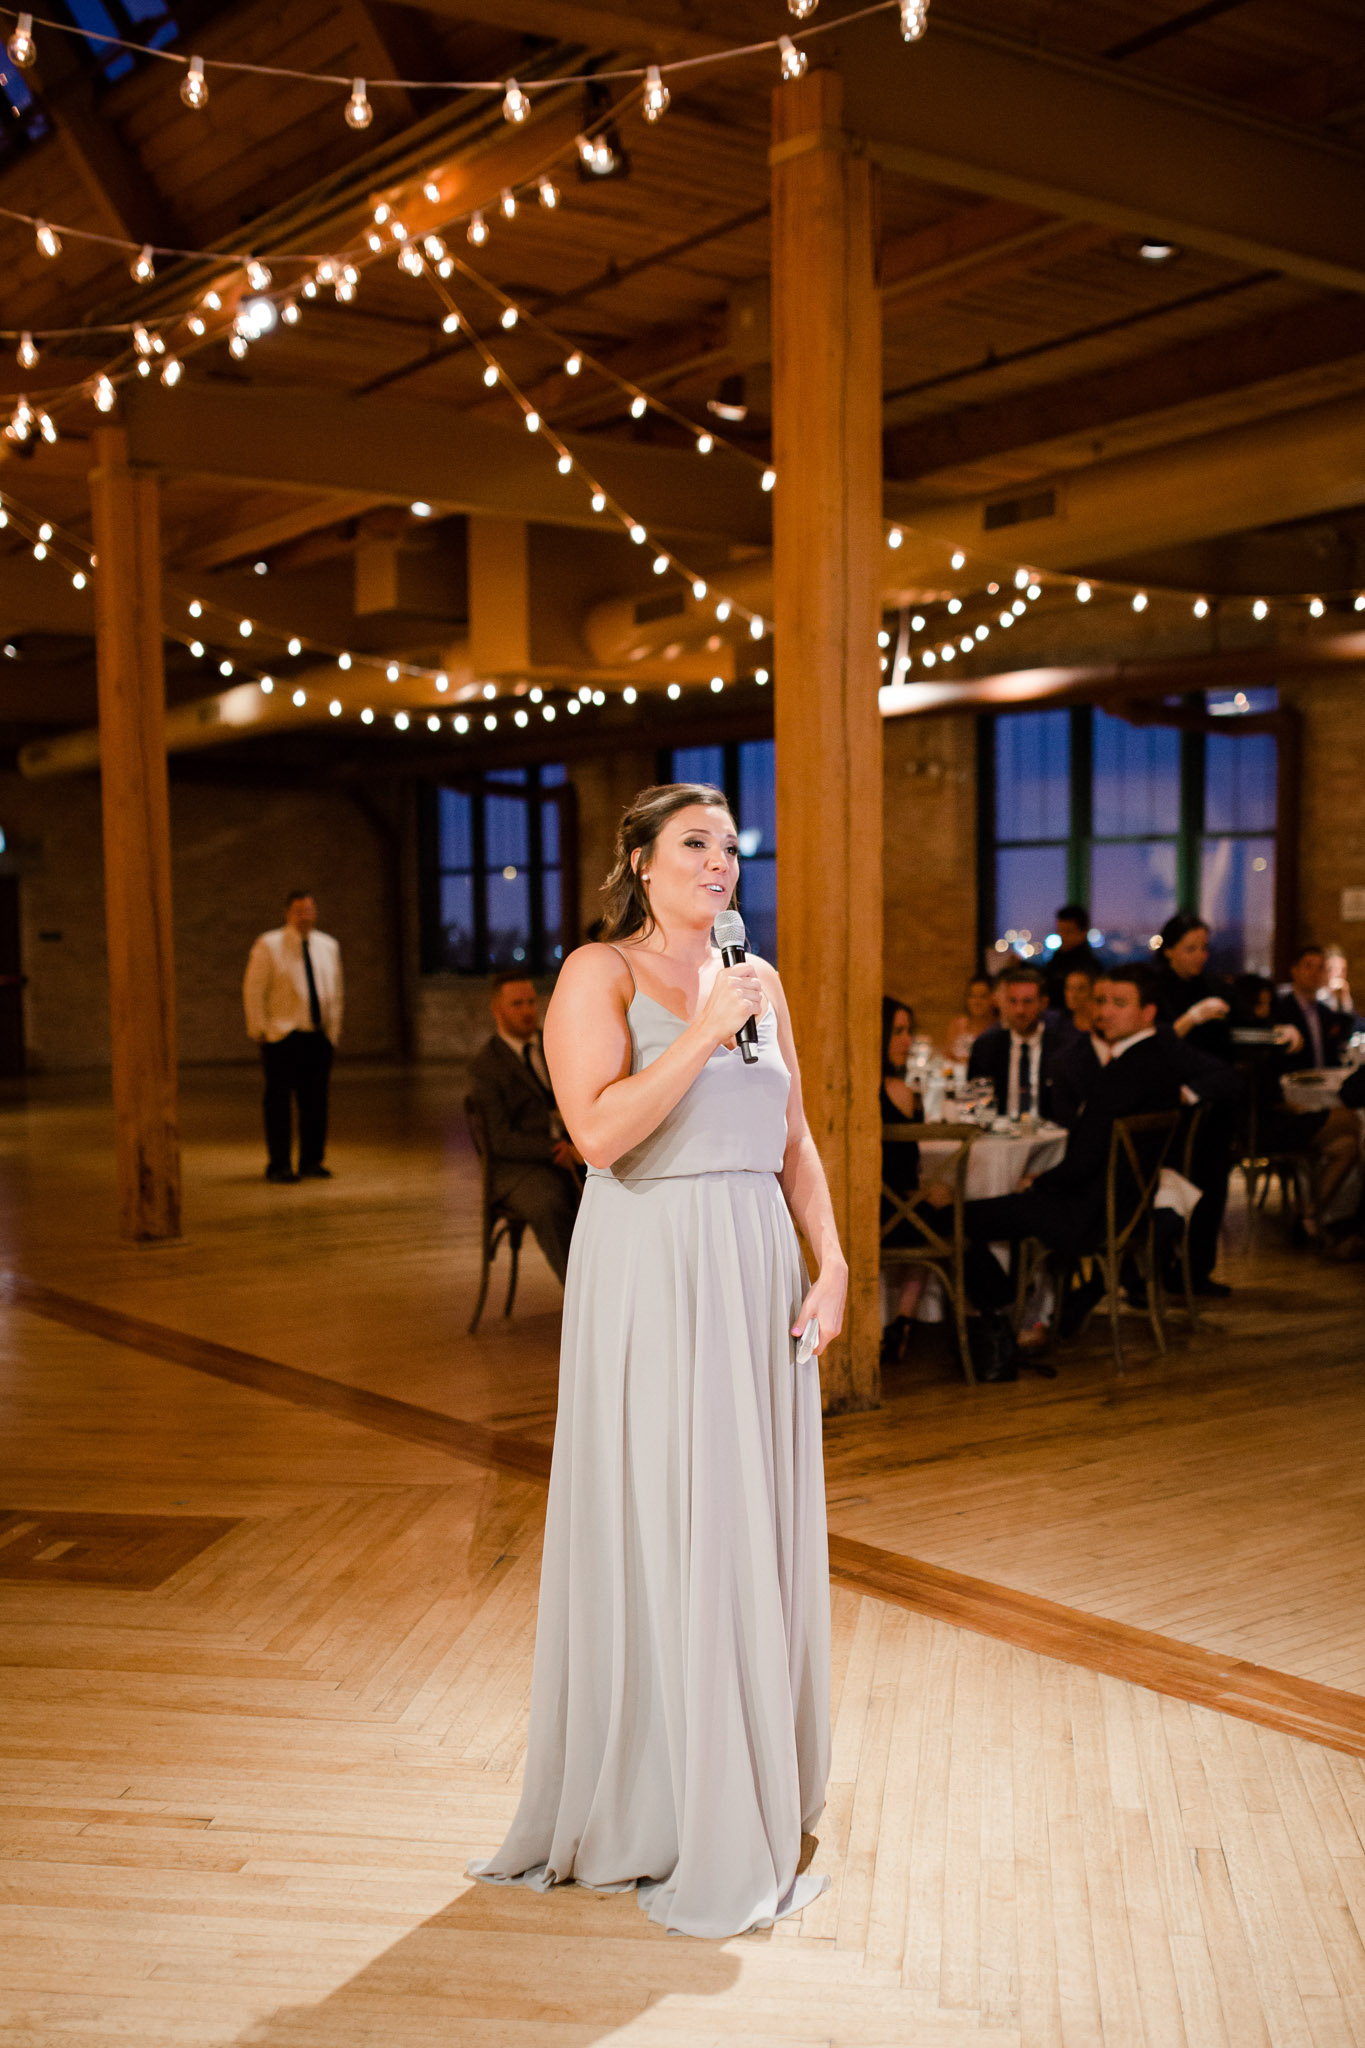 bridgeport-art-center-wedding-photos-40.jpg